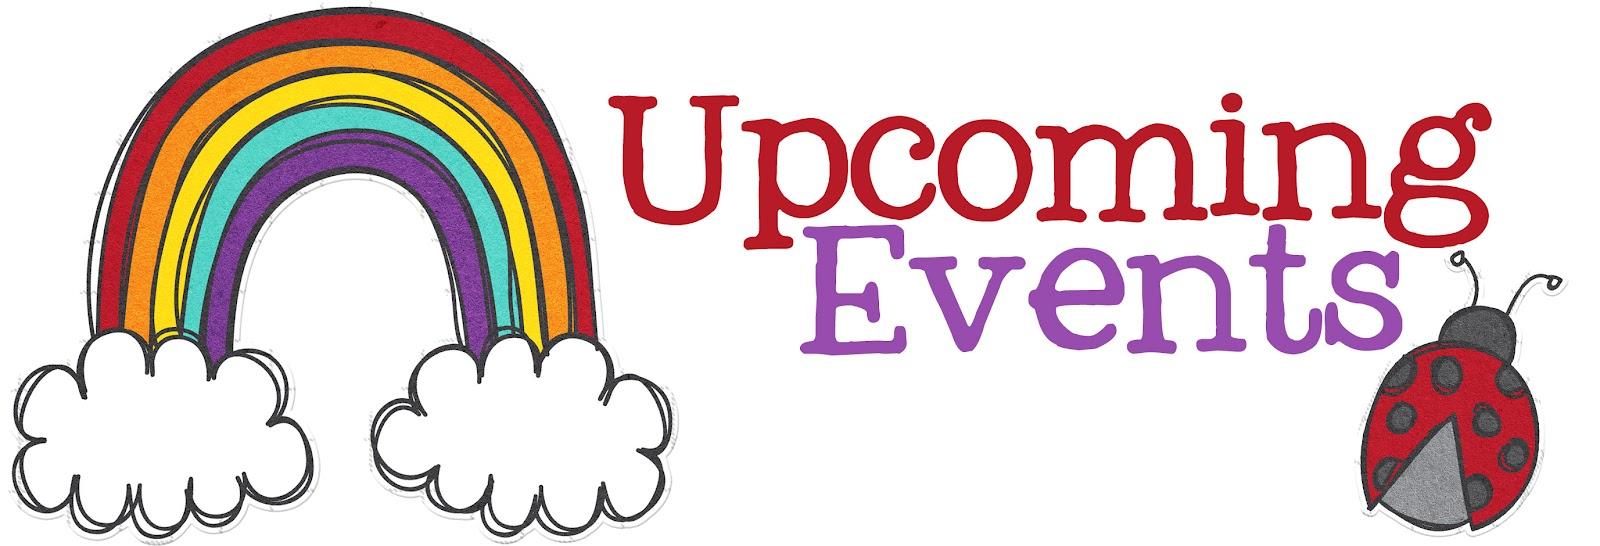 1600x546 Upcoming Events Clip Art Clipart